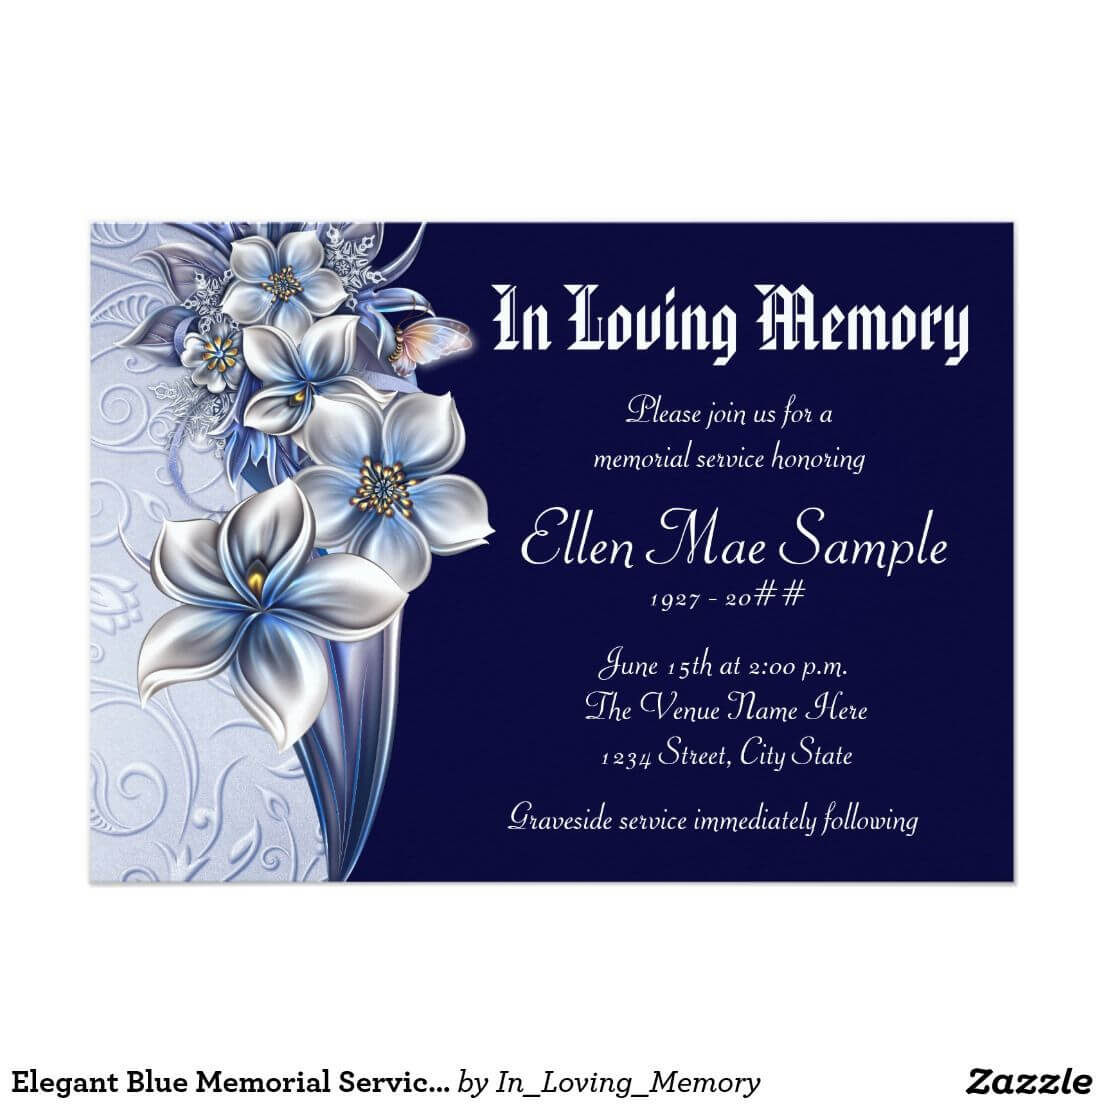 Elegant Blue Memorial Service Announcements | Zazzle pertaining to Funeral Invitation Card Template